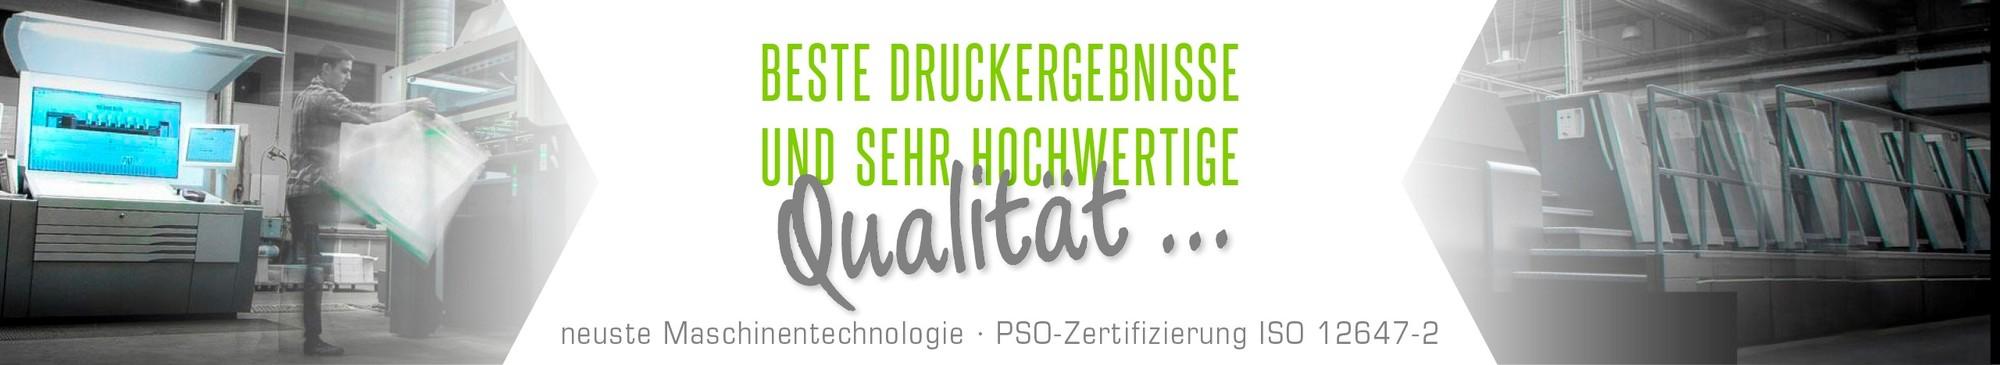 Onlinedruckerei mit modernsten Maschinentechnologien PSO Zertifizierung